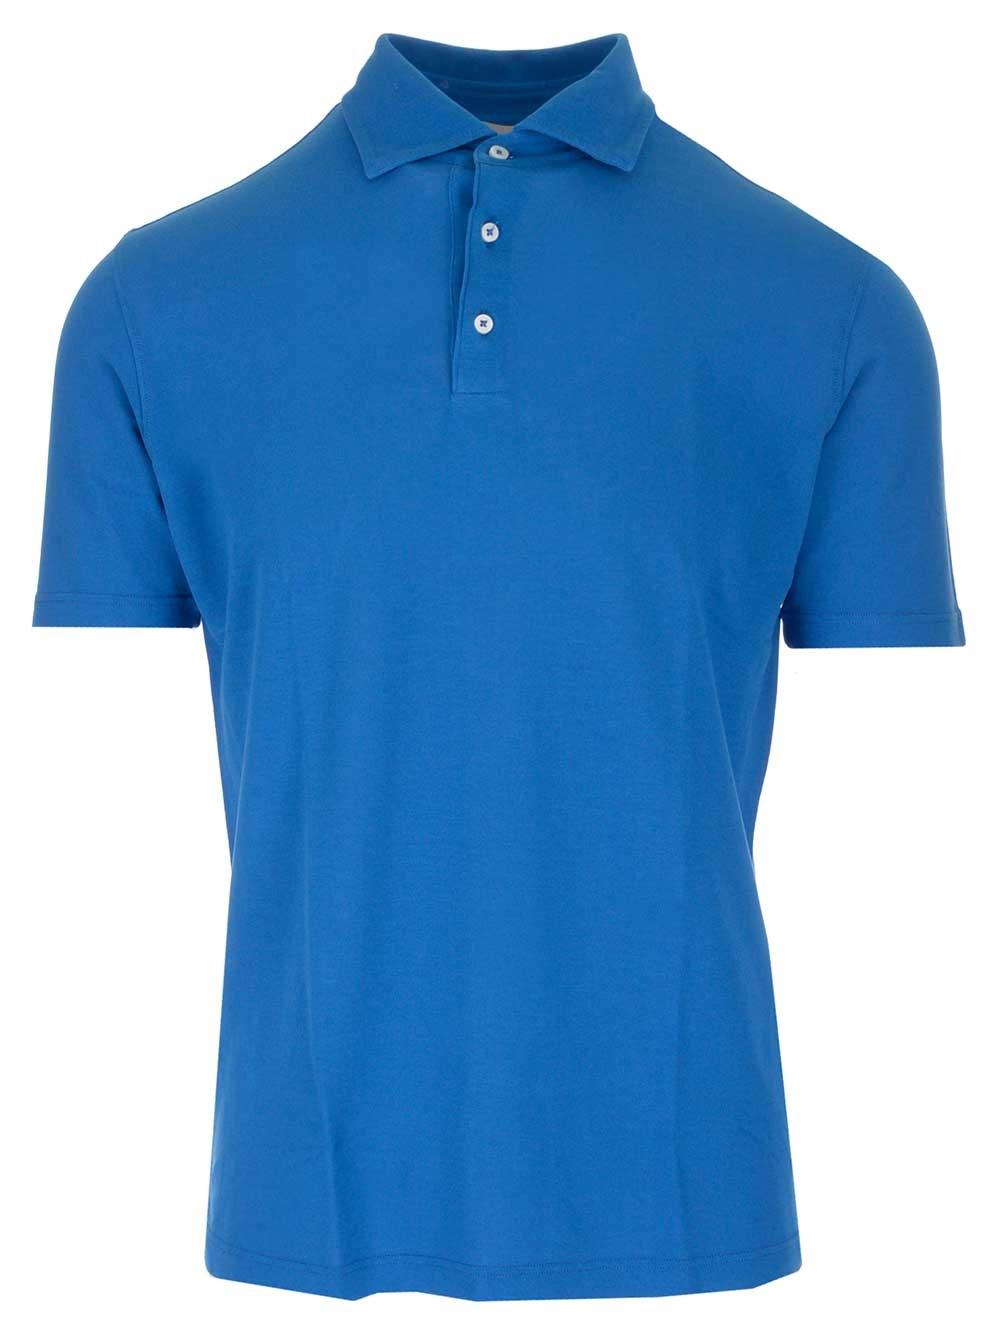 AL DUCA D'AOSTA Light Blue Polo Shirt In Cotton Crêpe